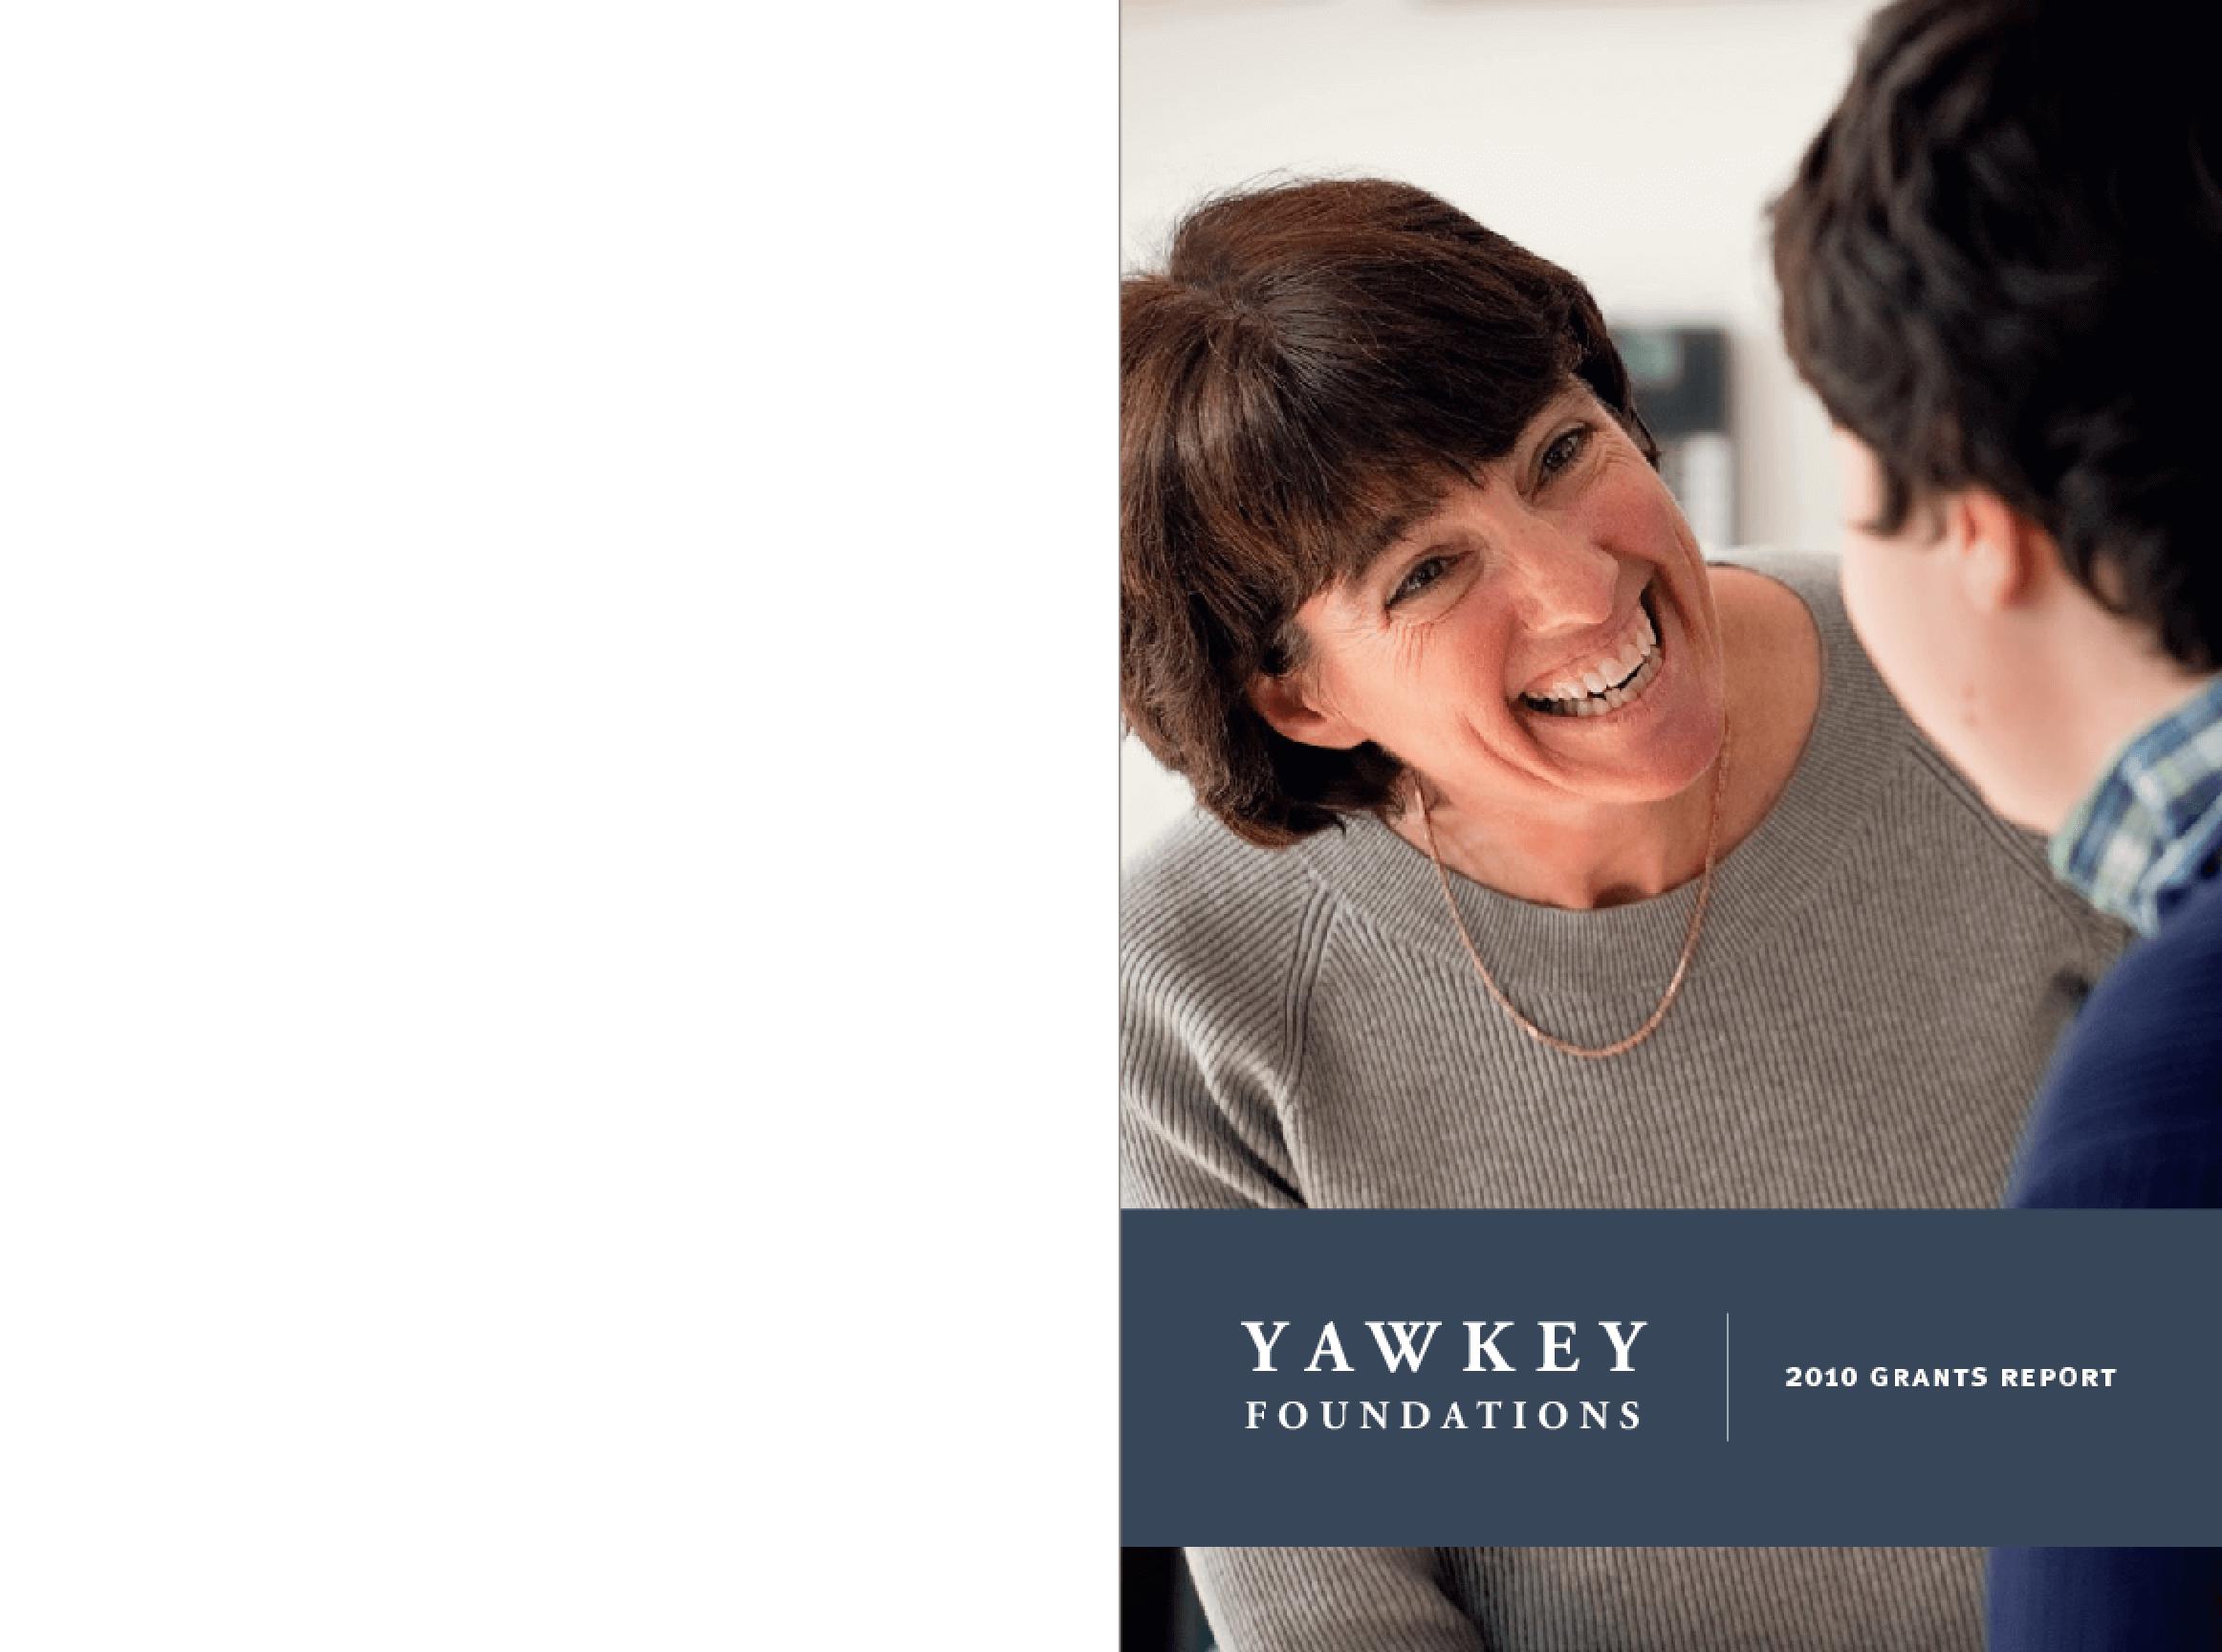 Yawkey Foundations 2010 Grants Report